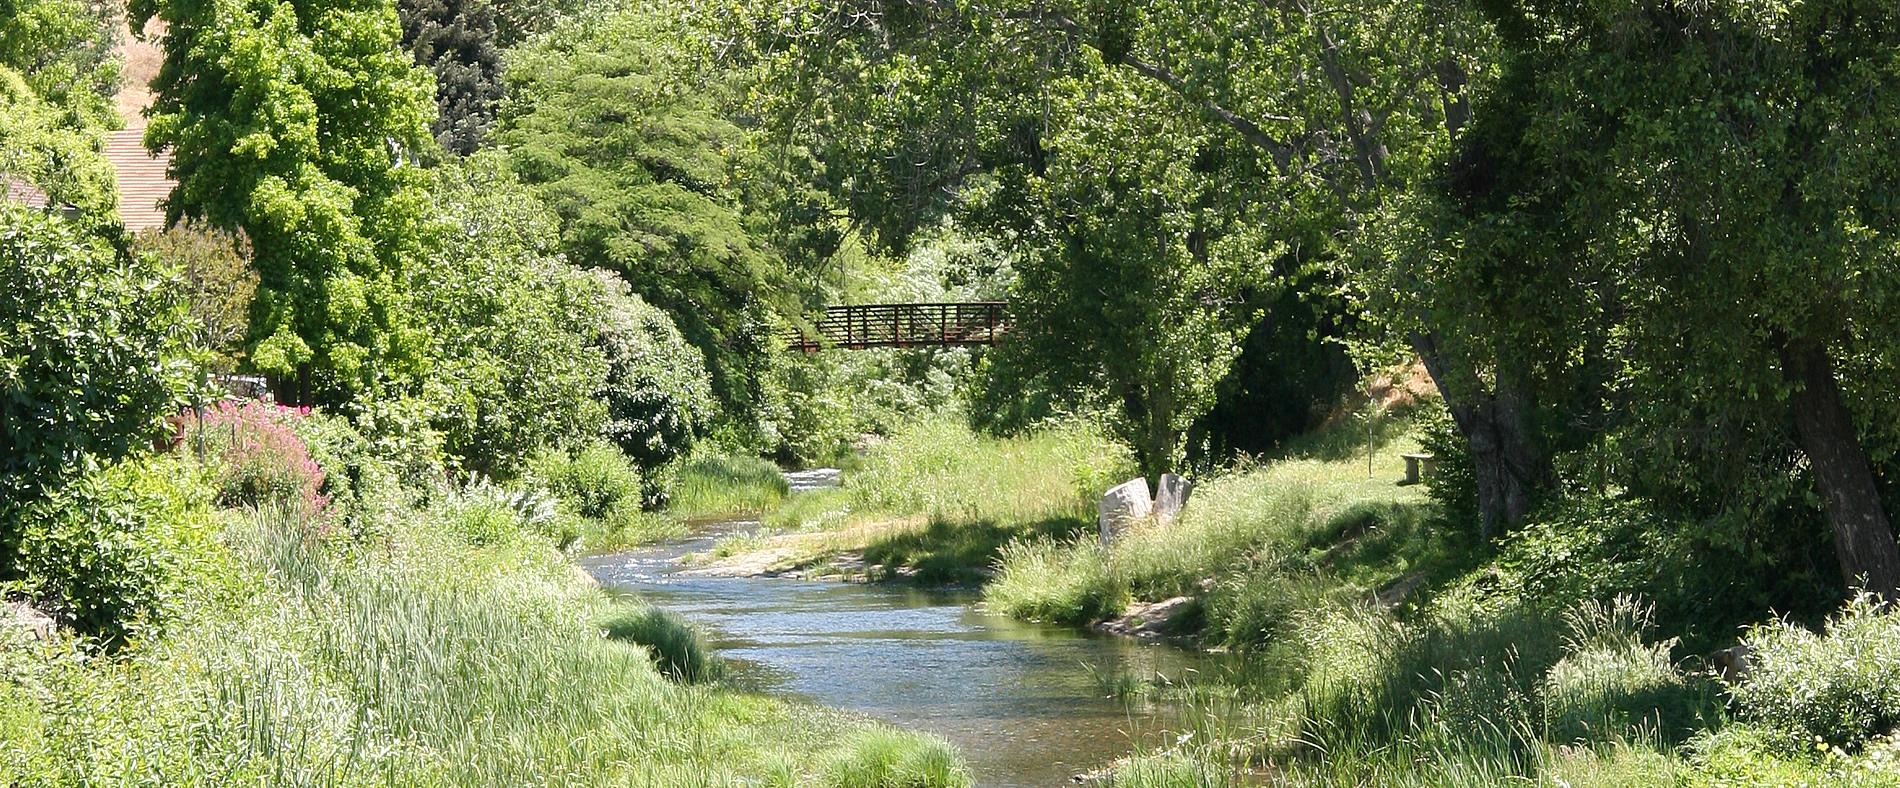 sutter creek and bridge